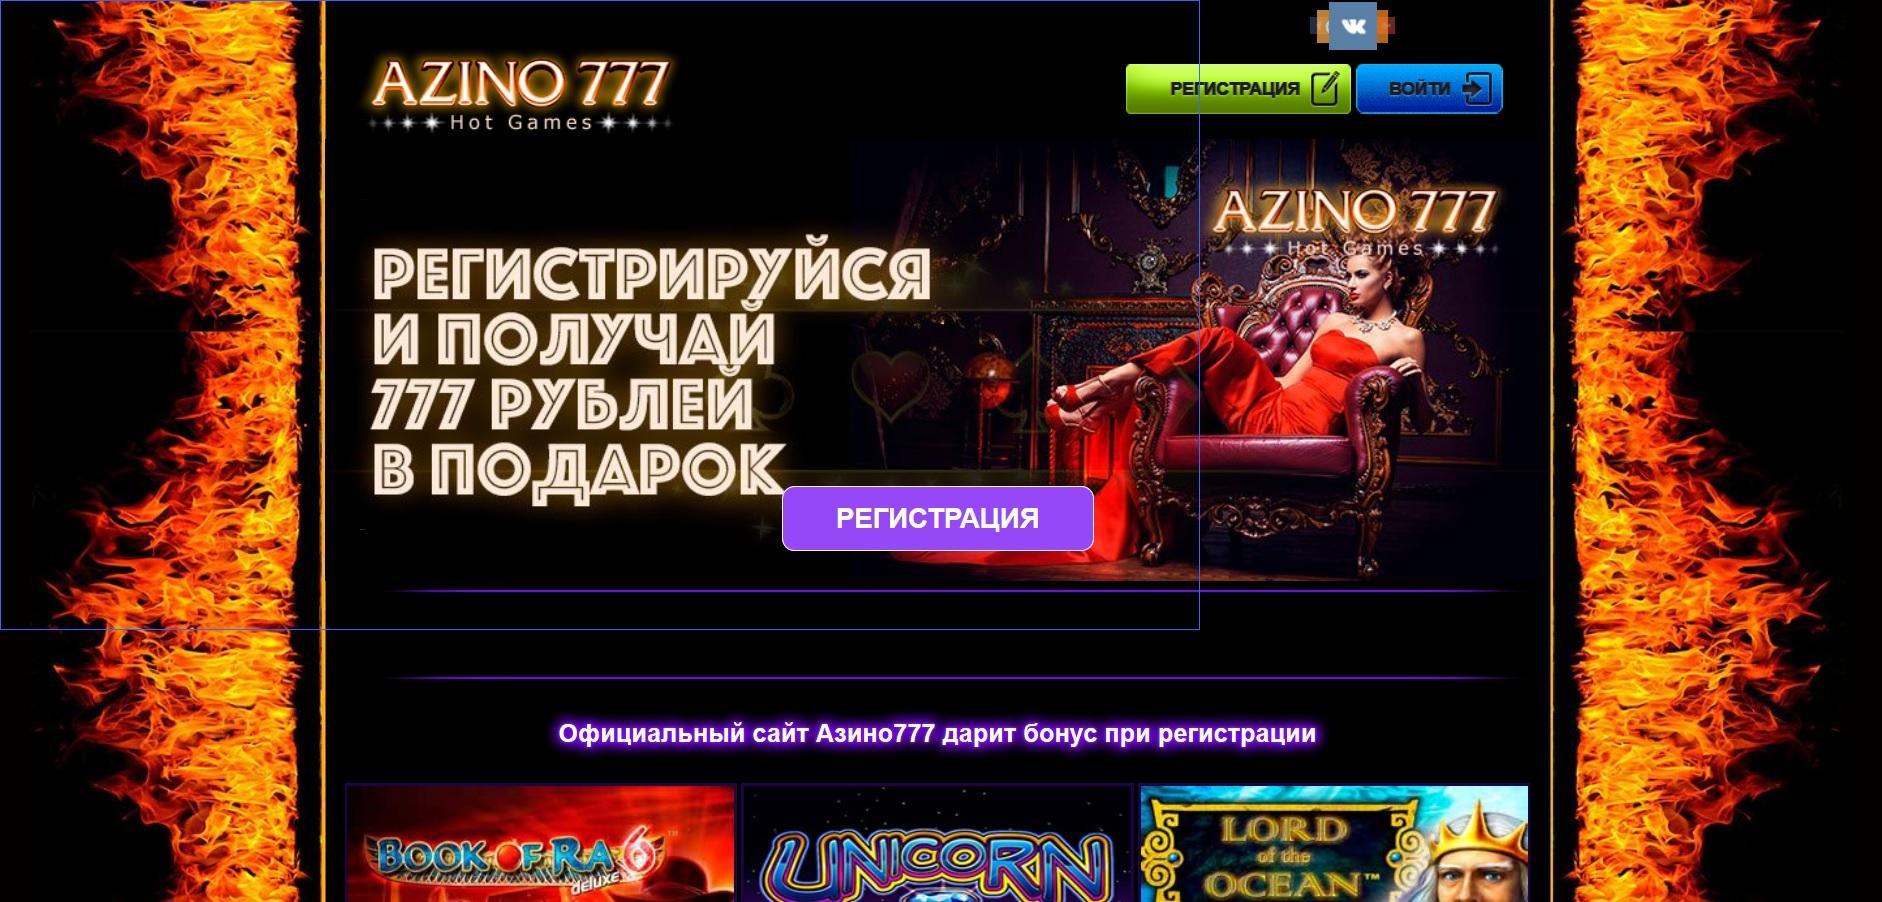 support azino777 com